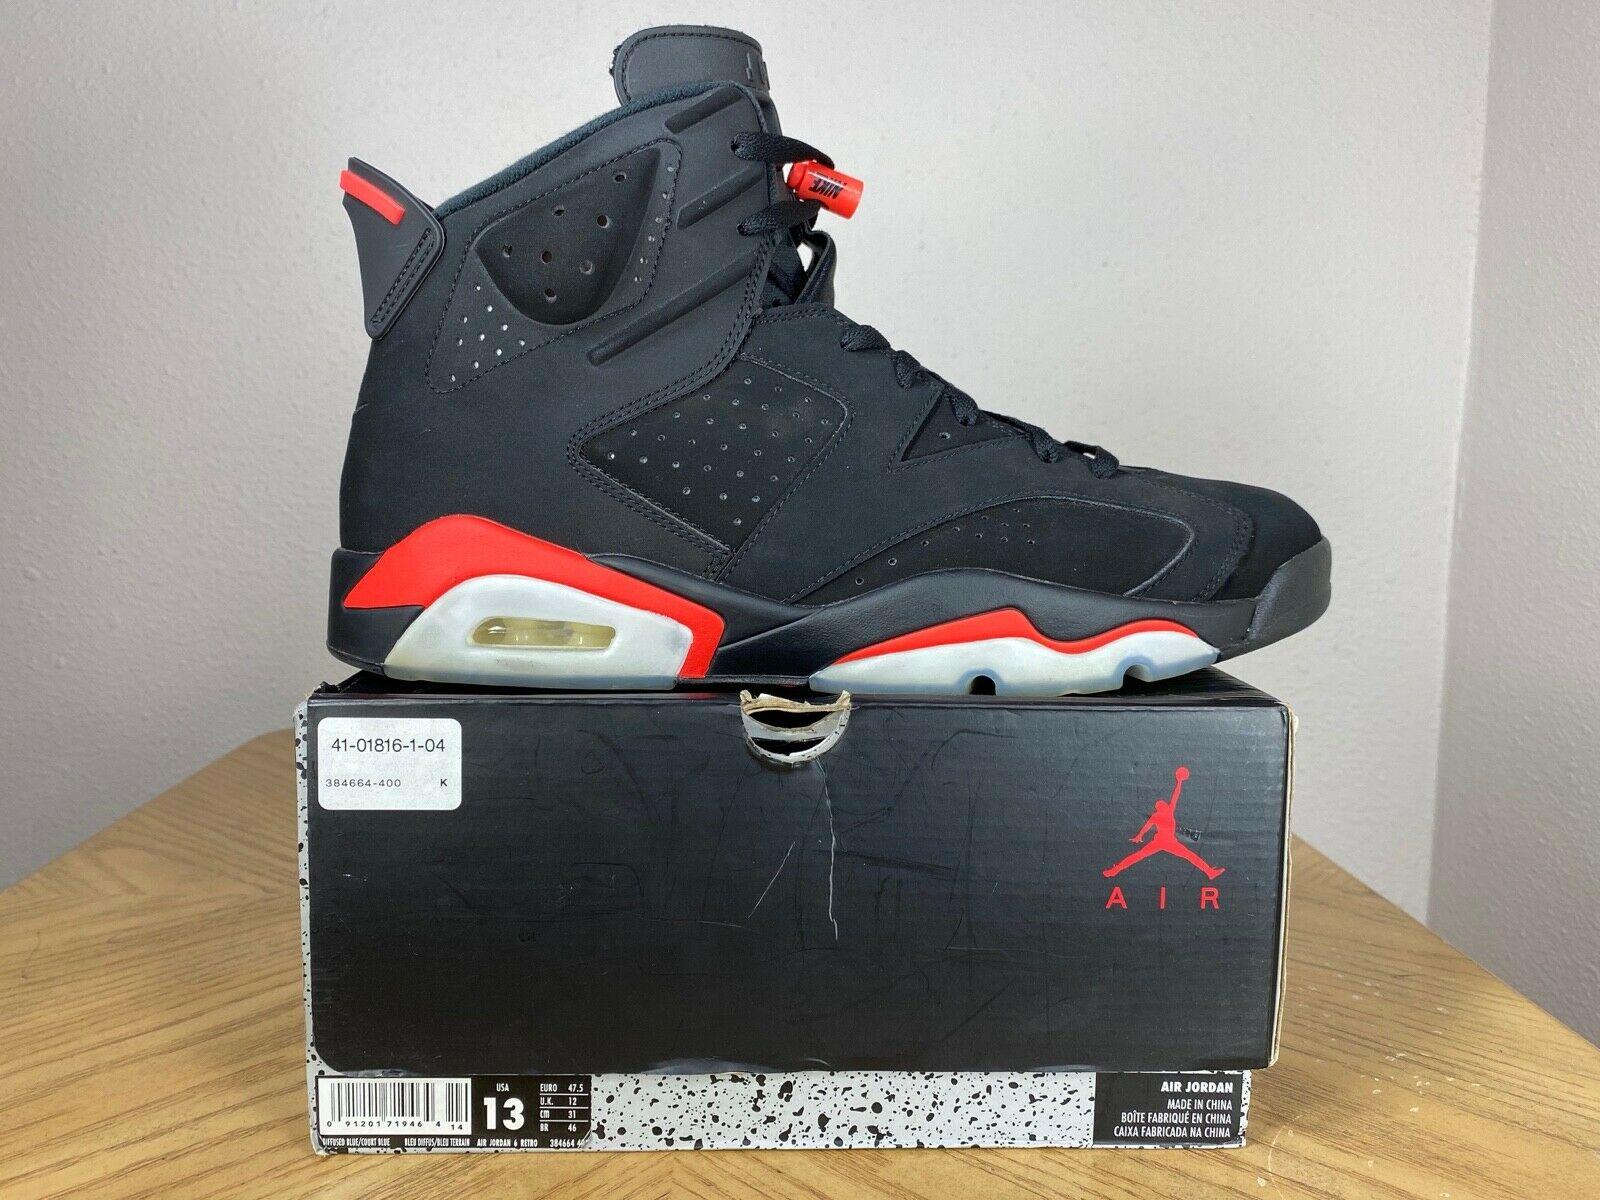 Jordan 6 Retro Black Infrared 2019